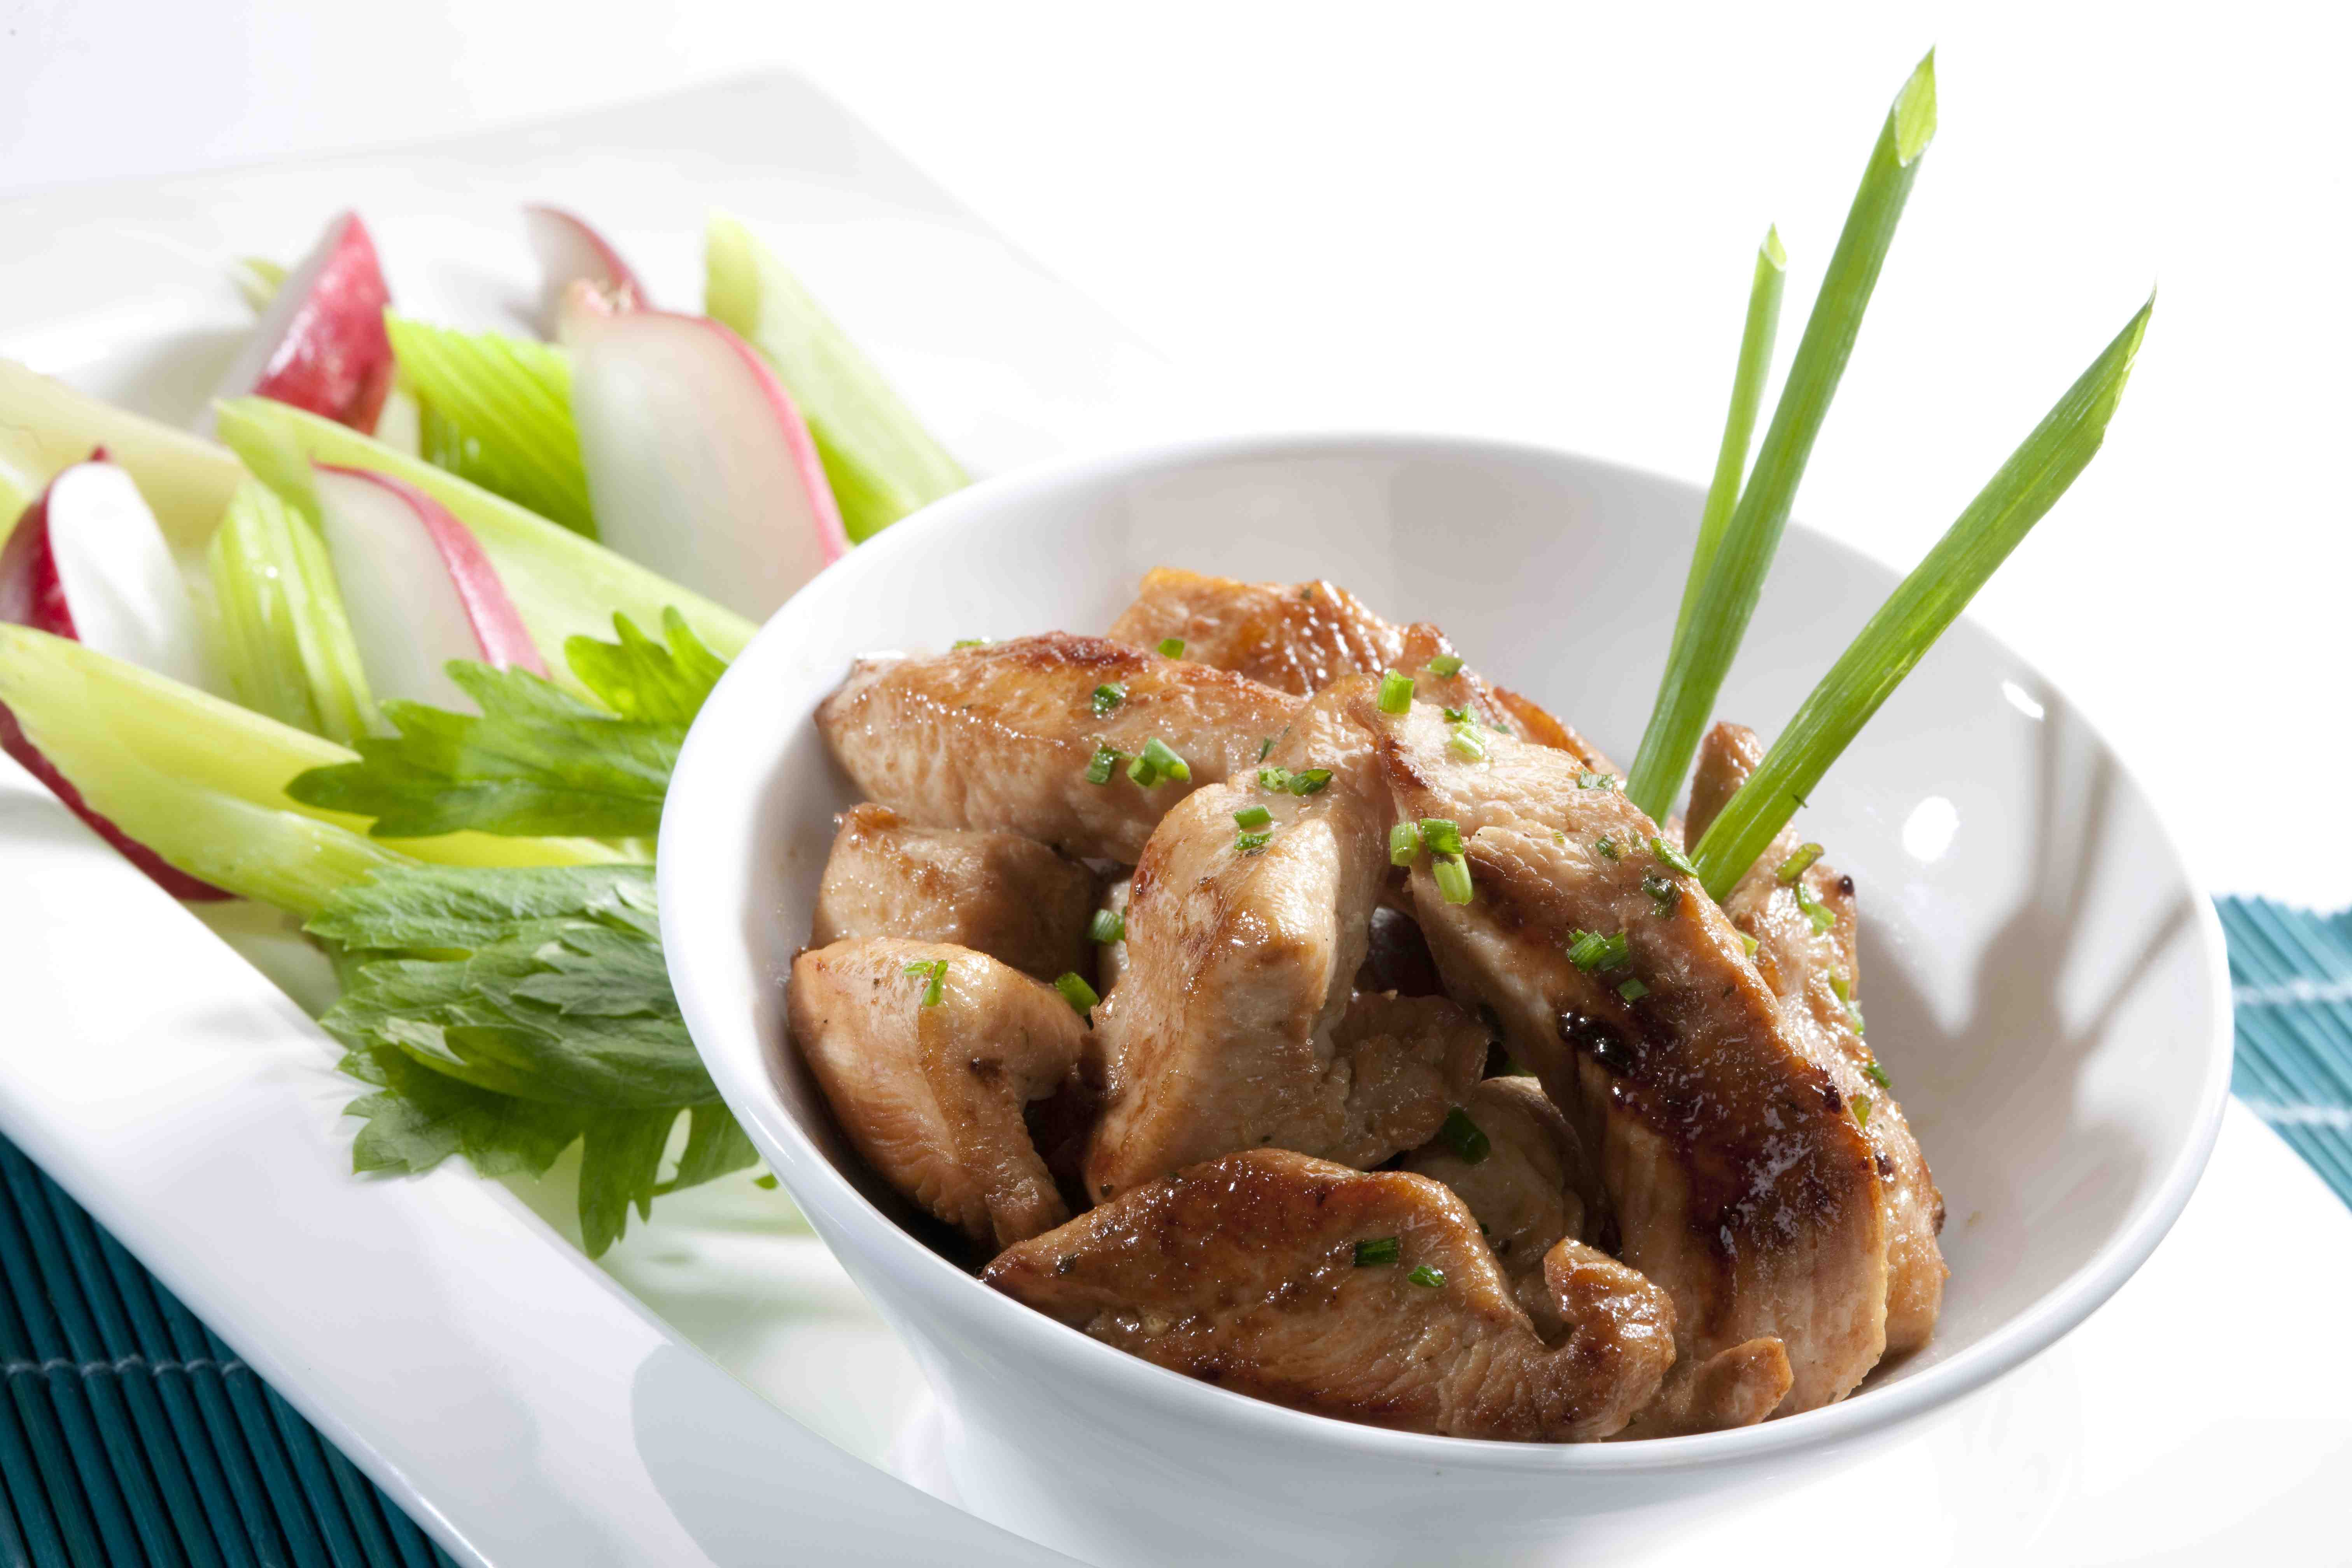 Tiritas de pollo y cebollín